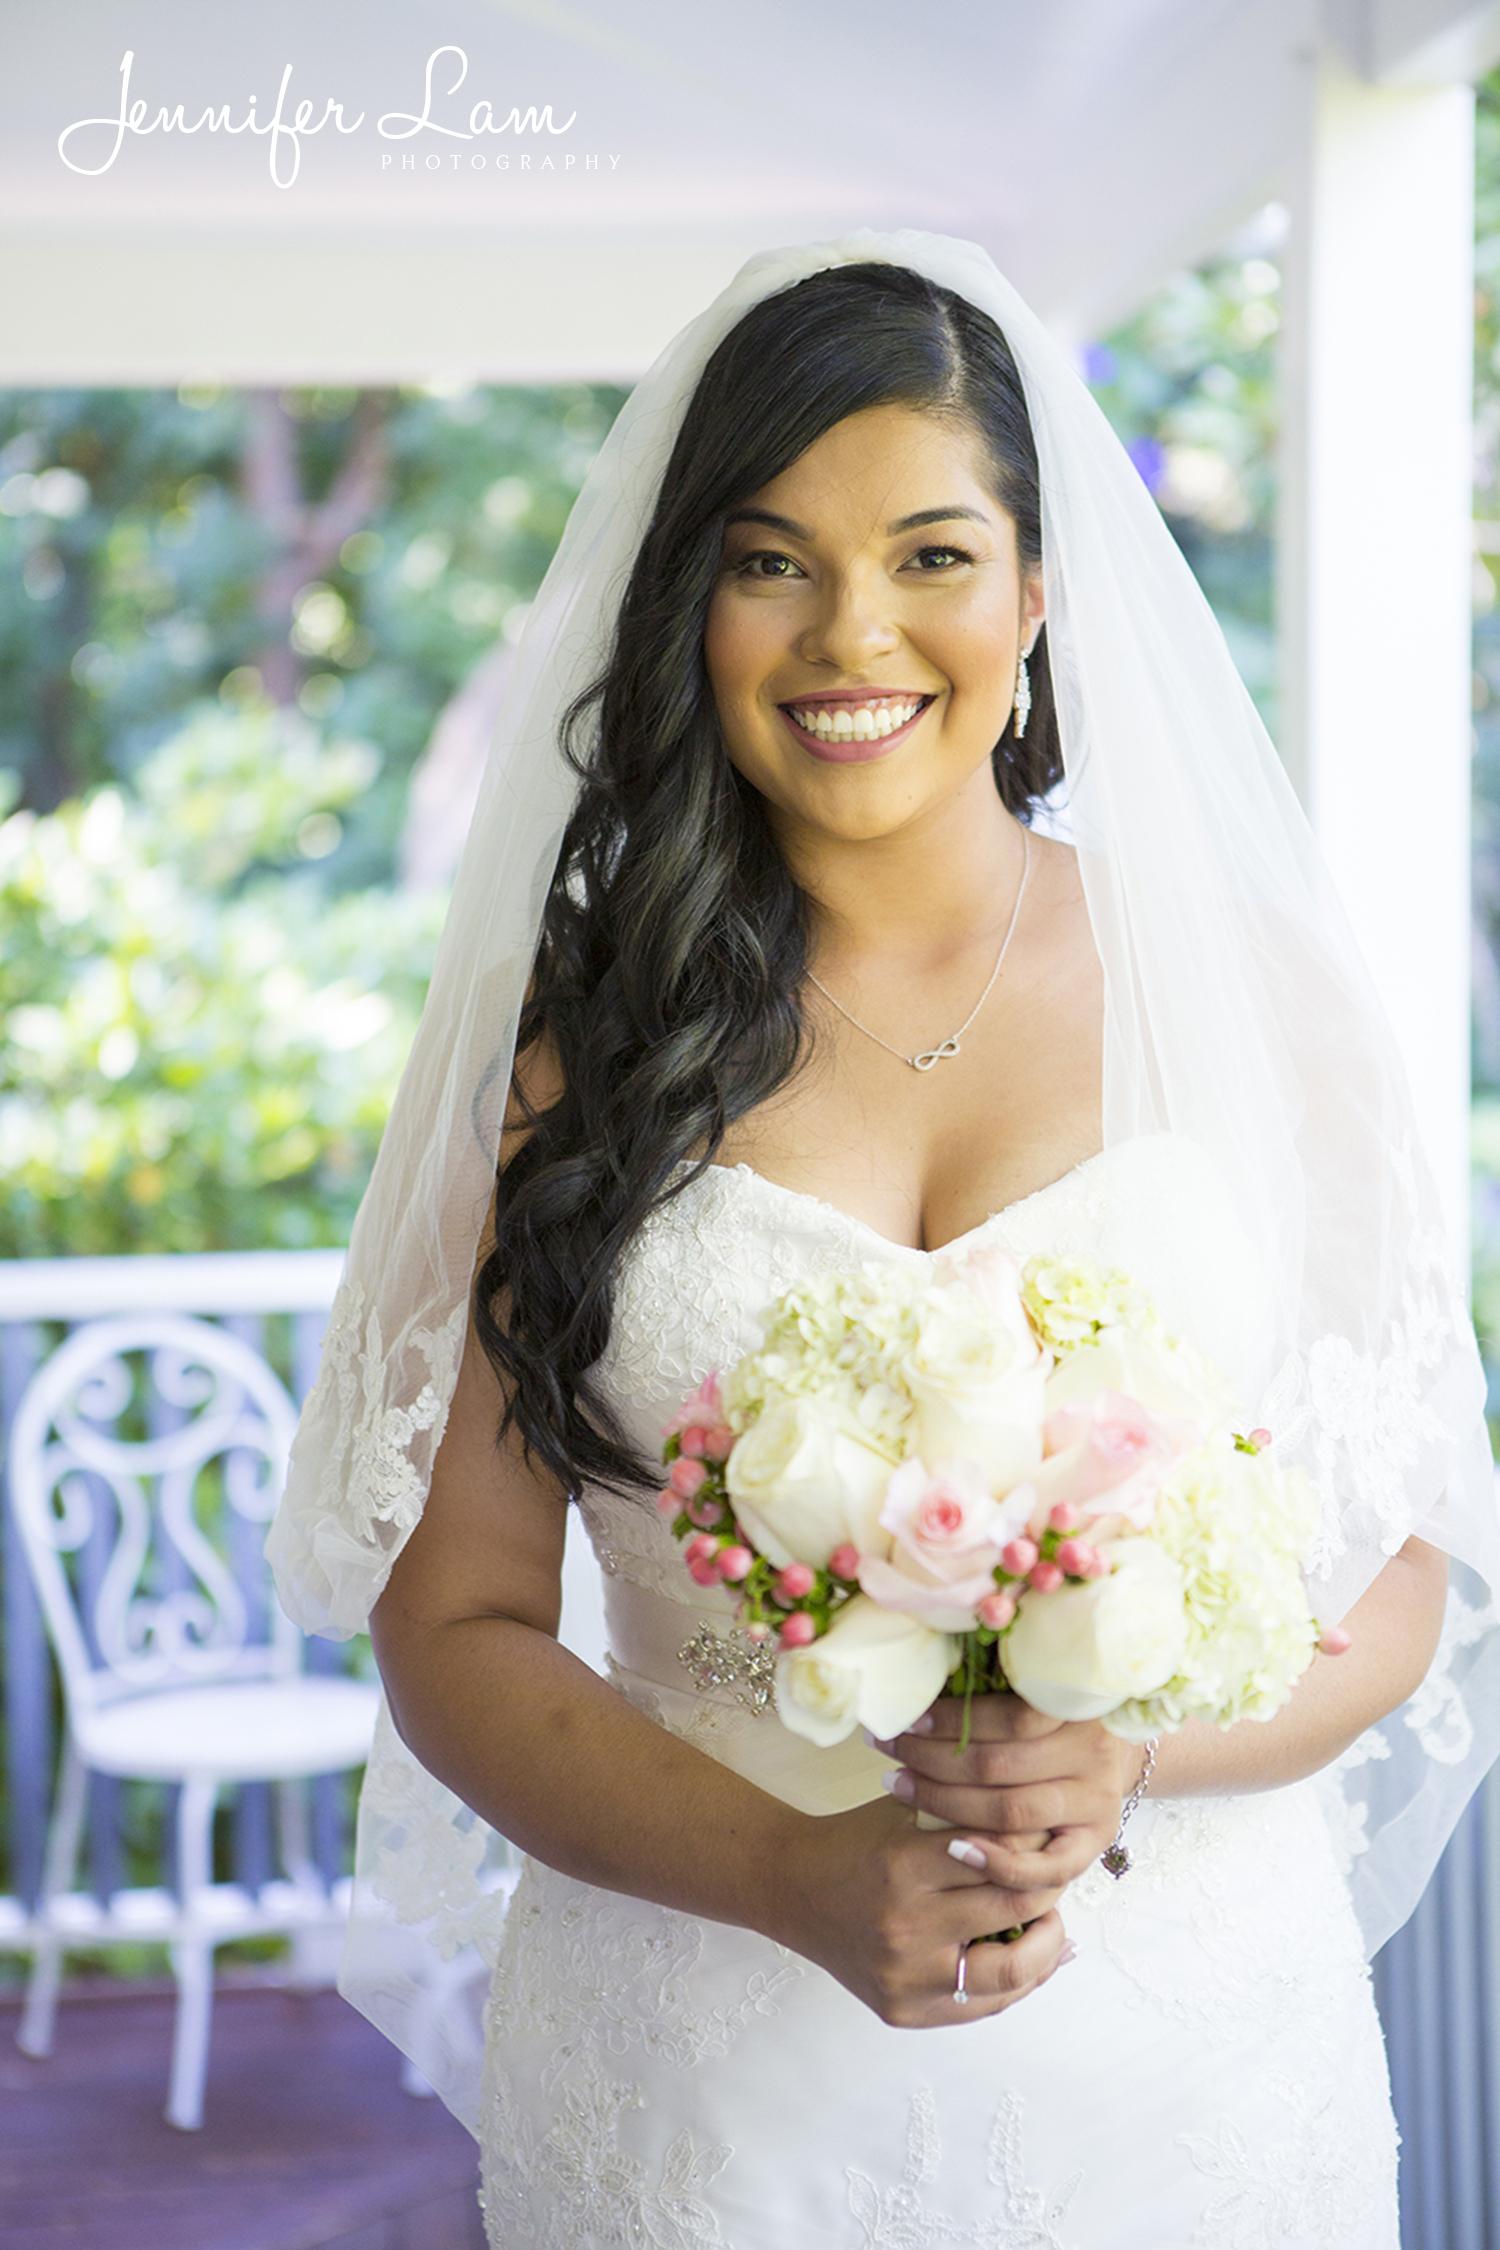 Sydney Wedding Photographer - Jennifer Lam Photography - www.jenniferlamphotography (16).jpg